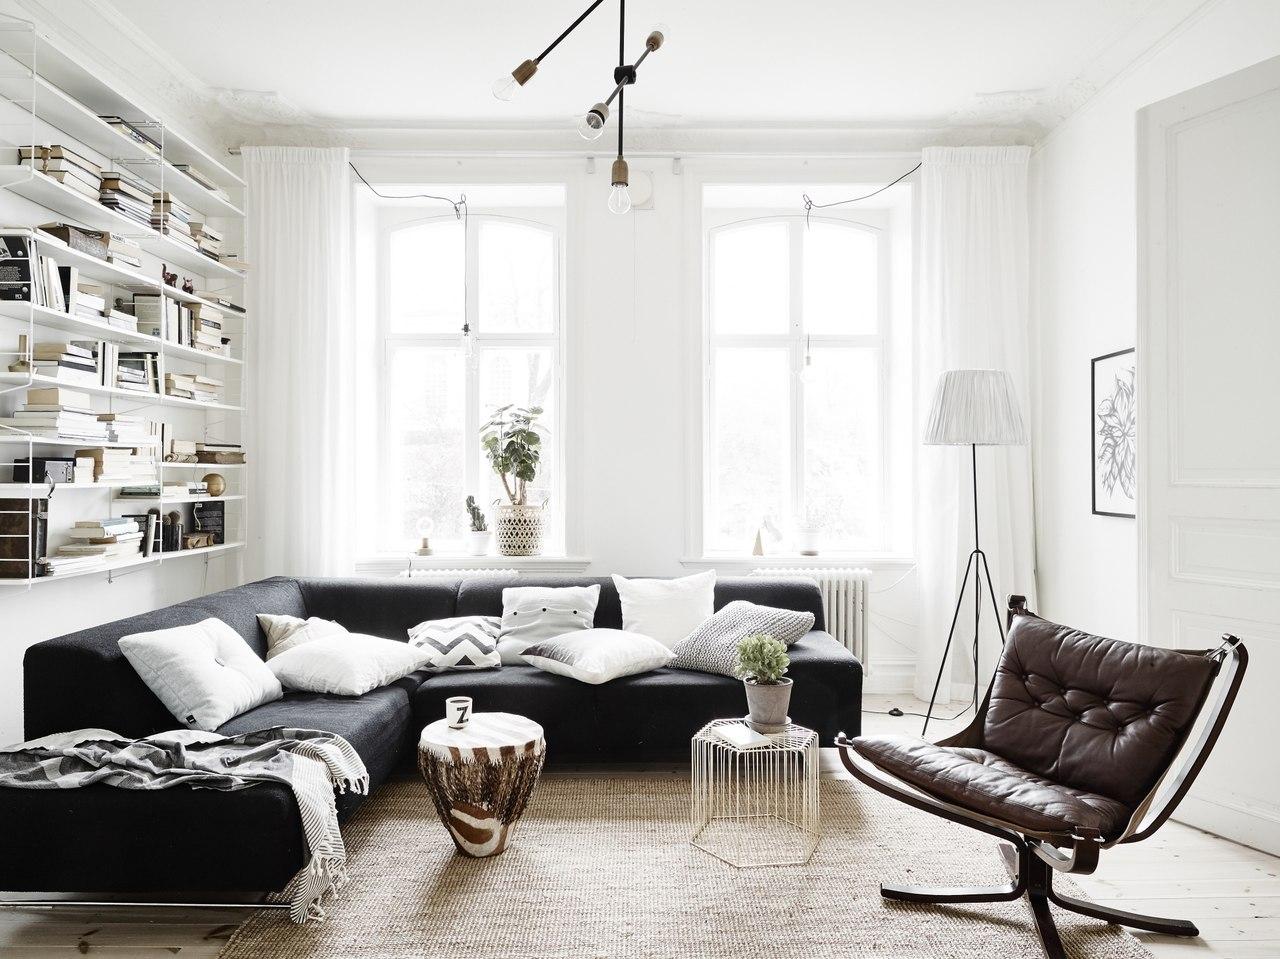 Дизайн интерьера двухкомнатной квартиры в шведском стиле